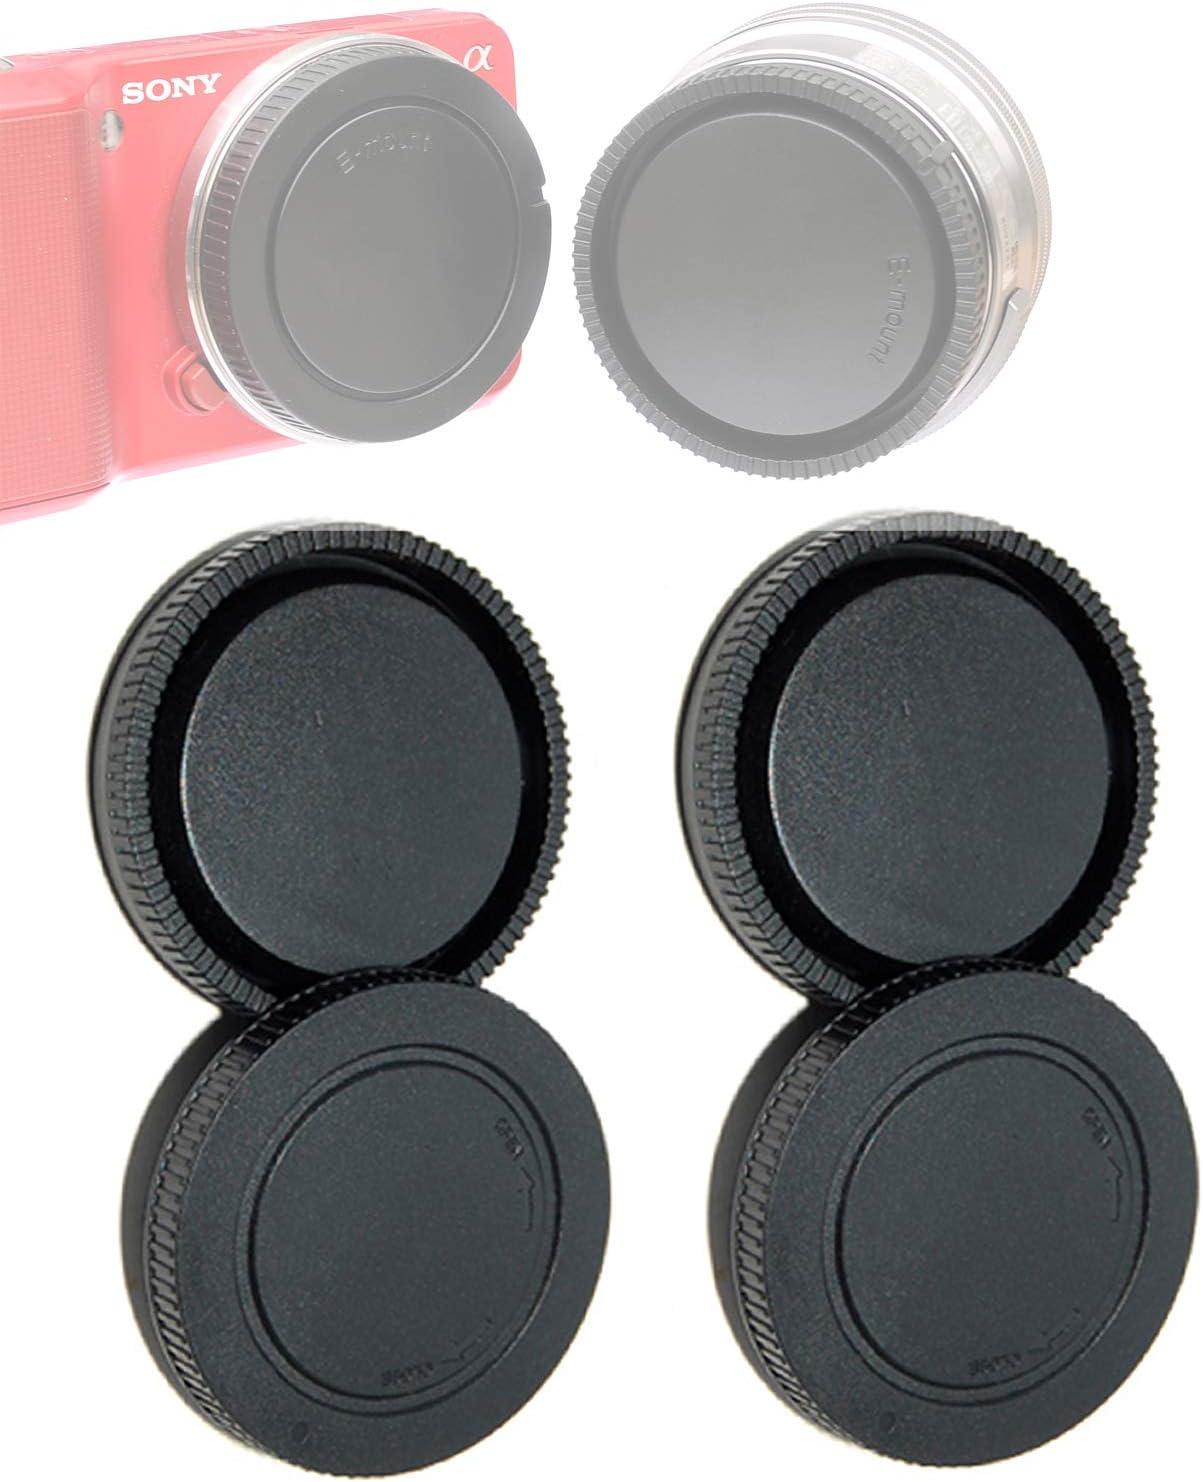 Sony NEX Housing Cover /& Lens Back Cover Housing Cap Body Cap